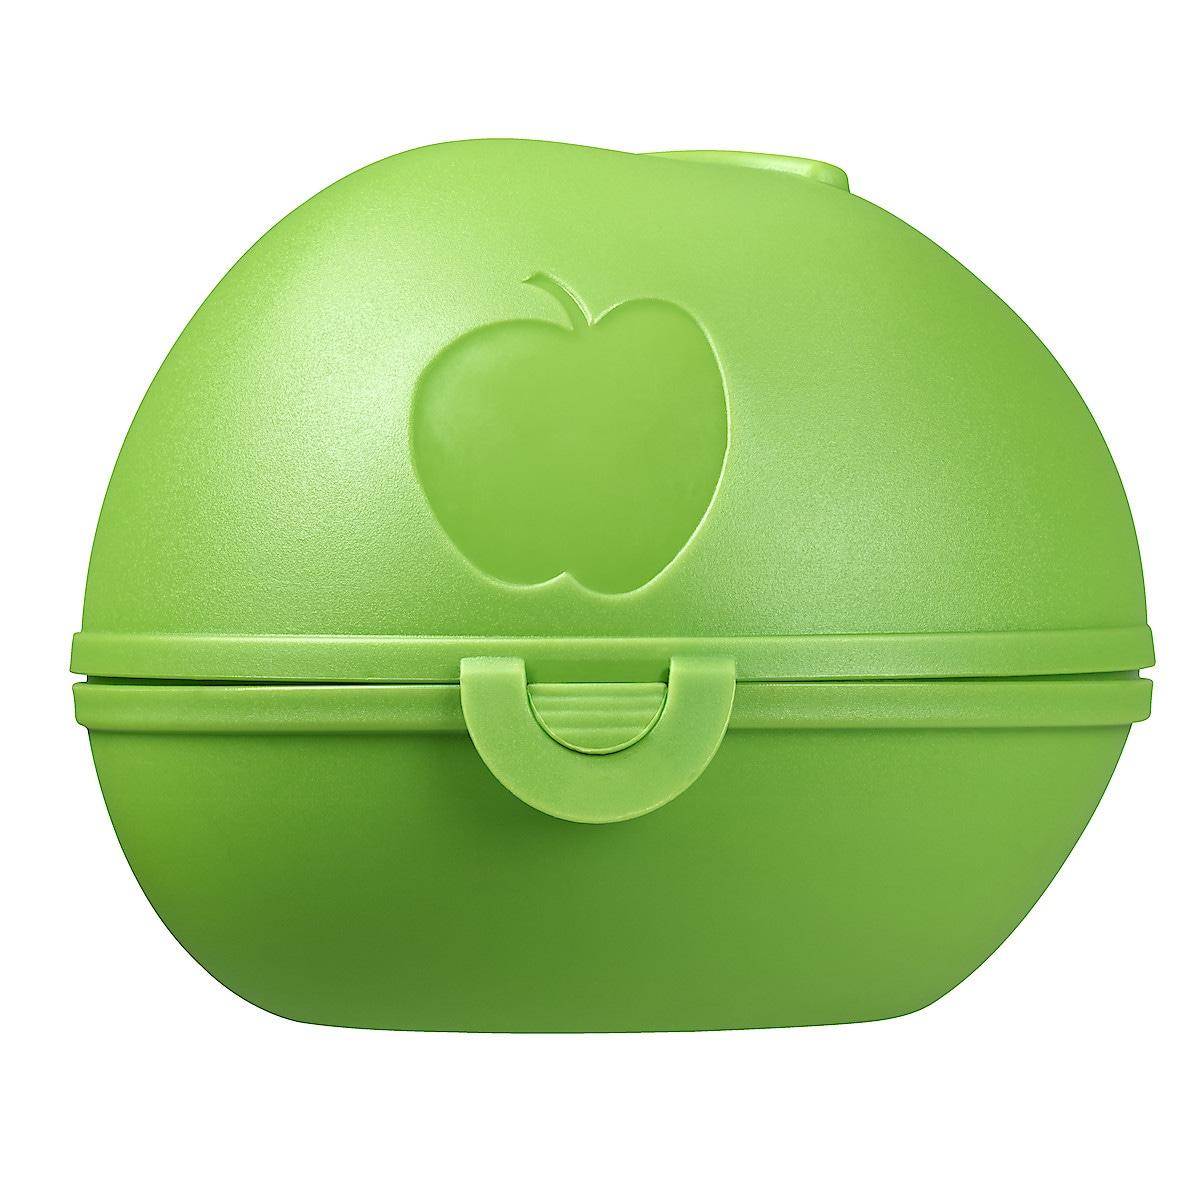 Apple Case